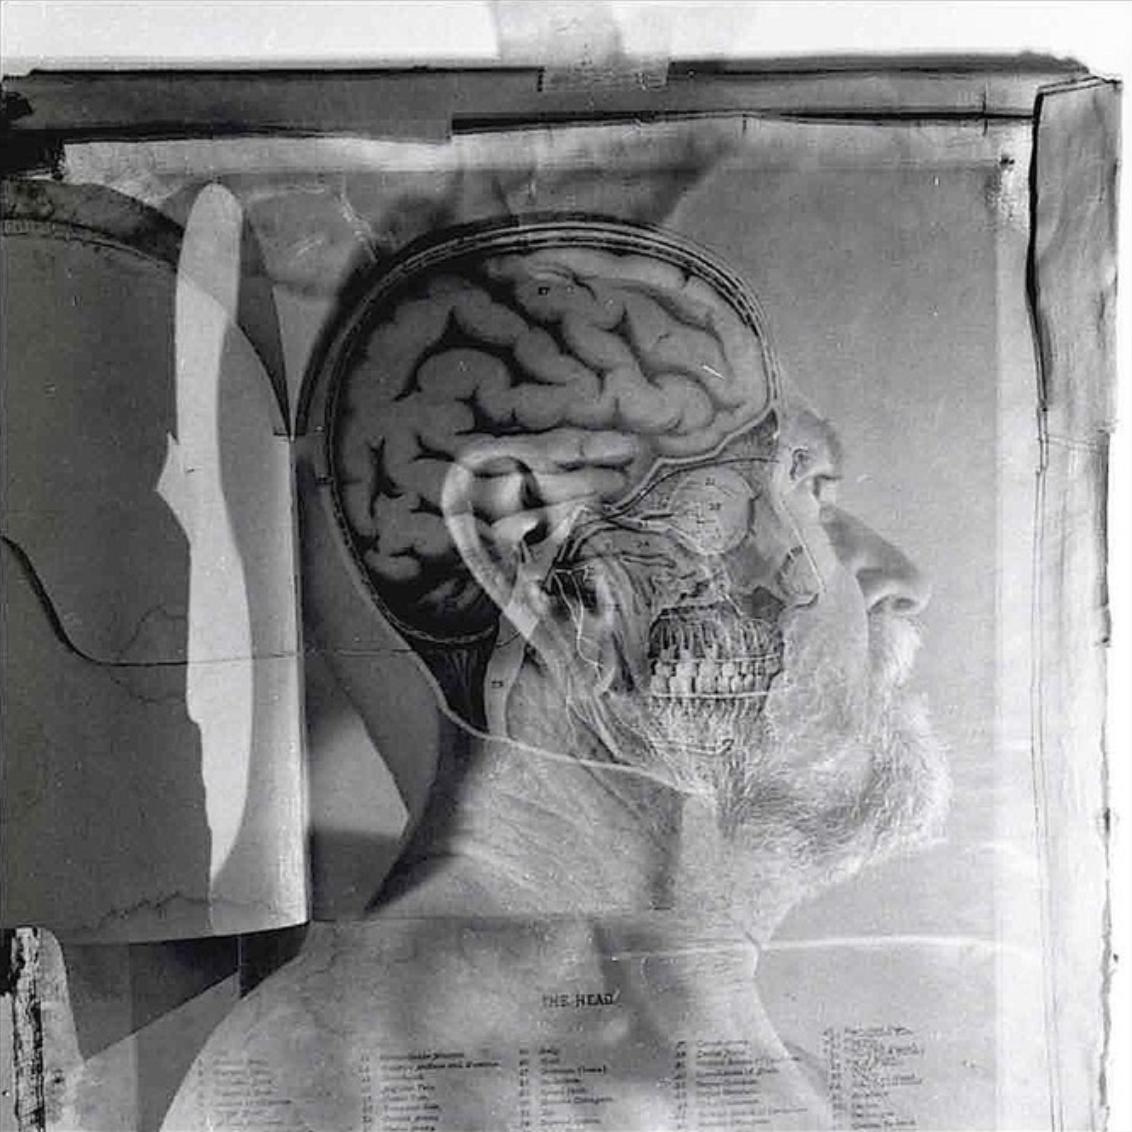 THE HEAD- Self Portrait